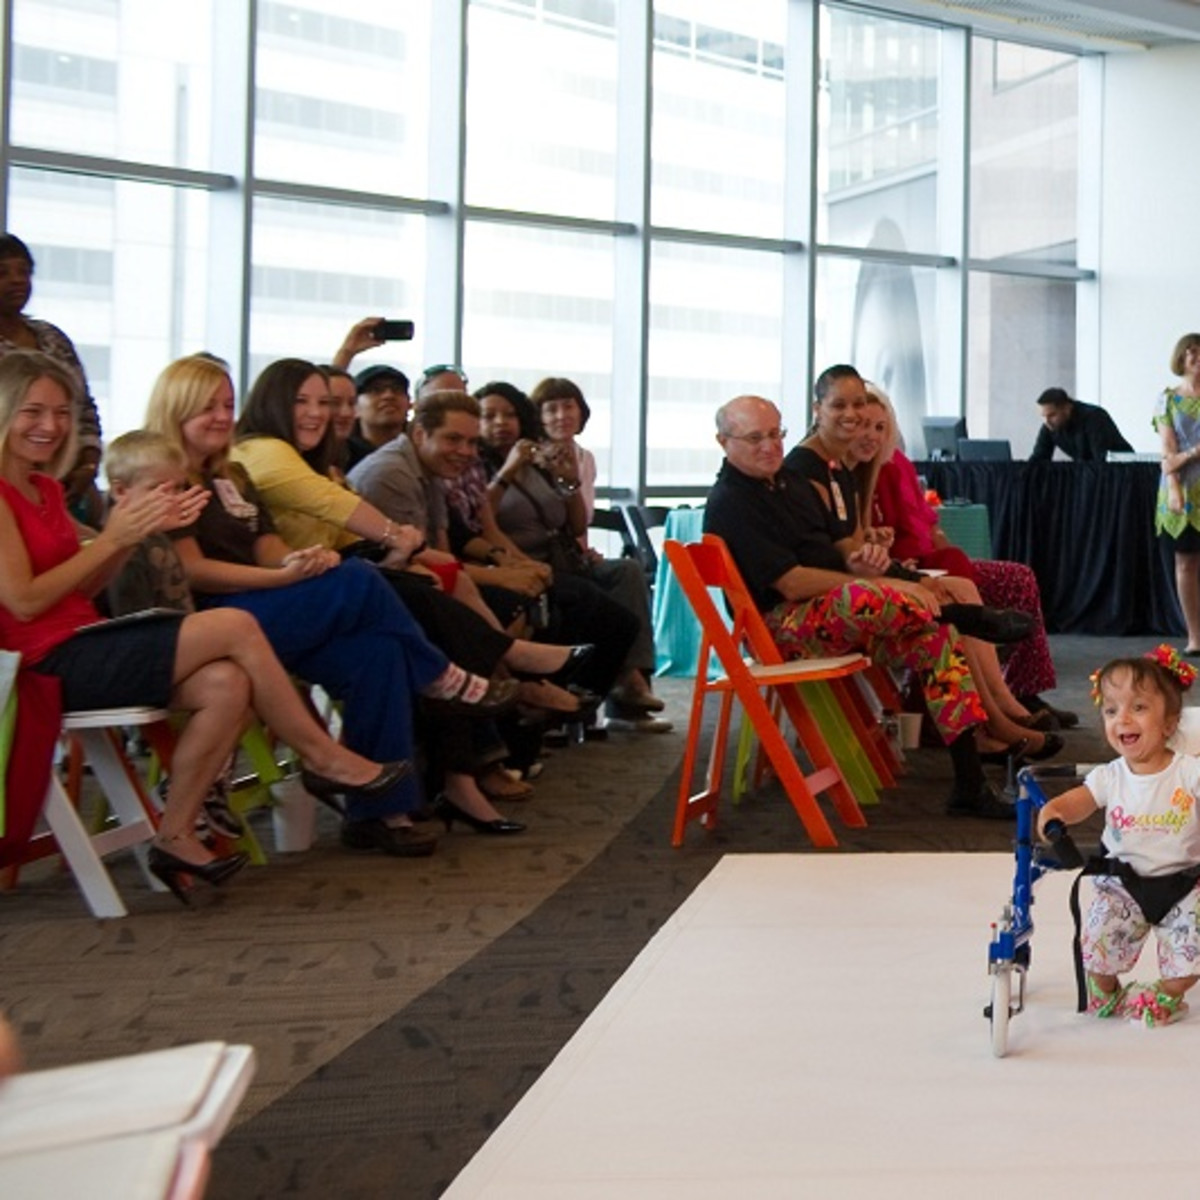 Bad Pants Fashion Show, Nalah Best, Jill Bendixen, Texas Children's Hospital, 2012